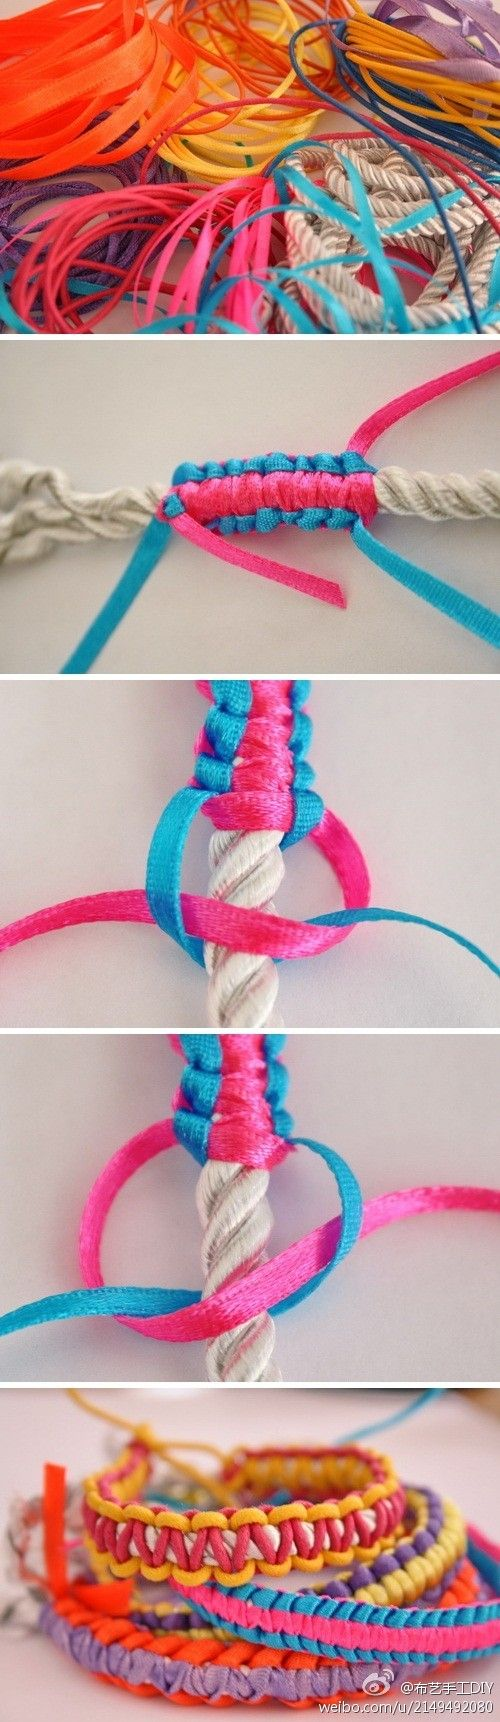 DIY - Ribbon Bracelet - here's a craft idea to keep kids